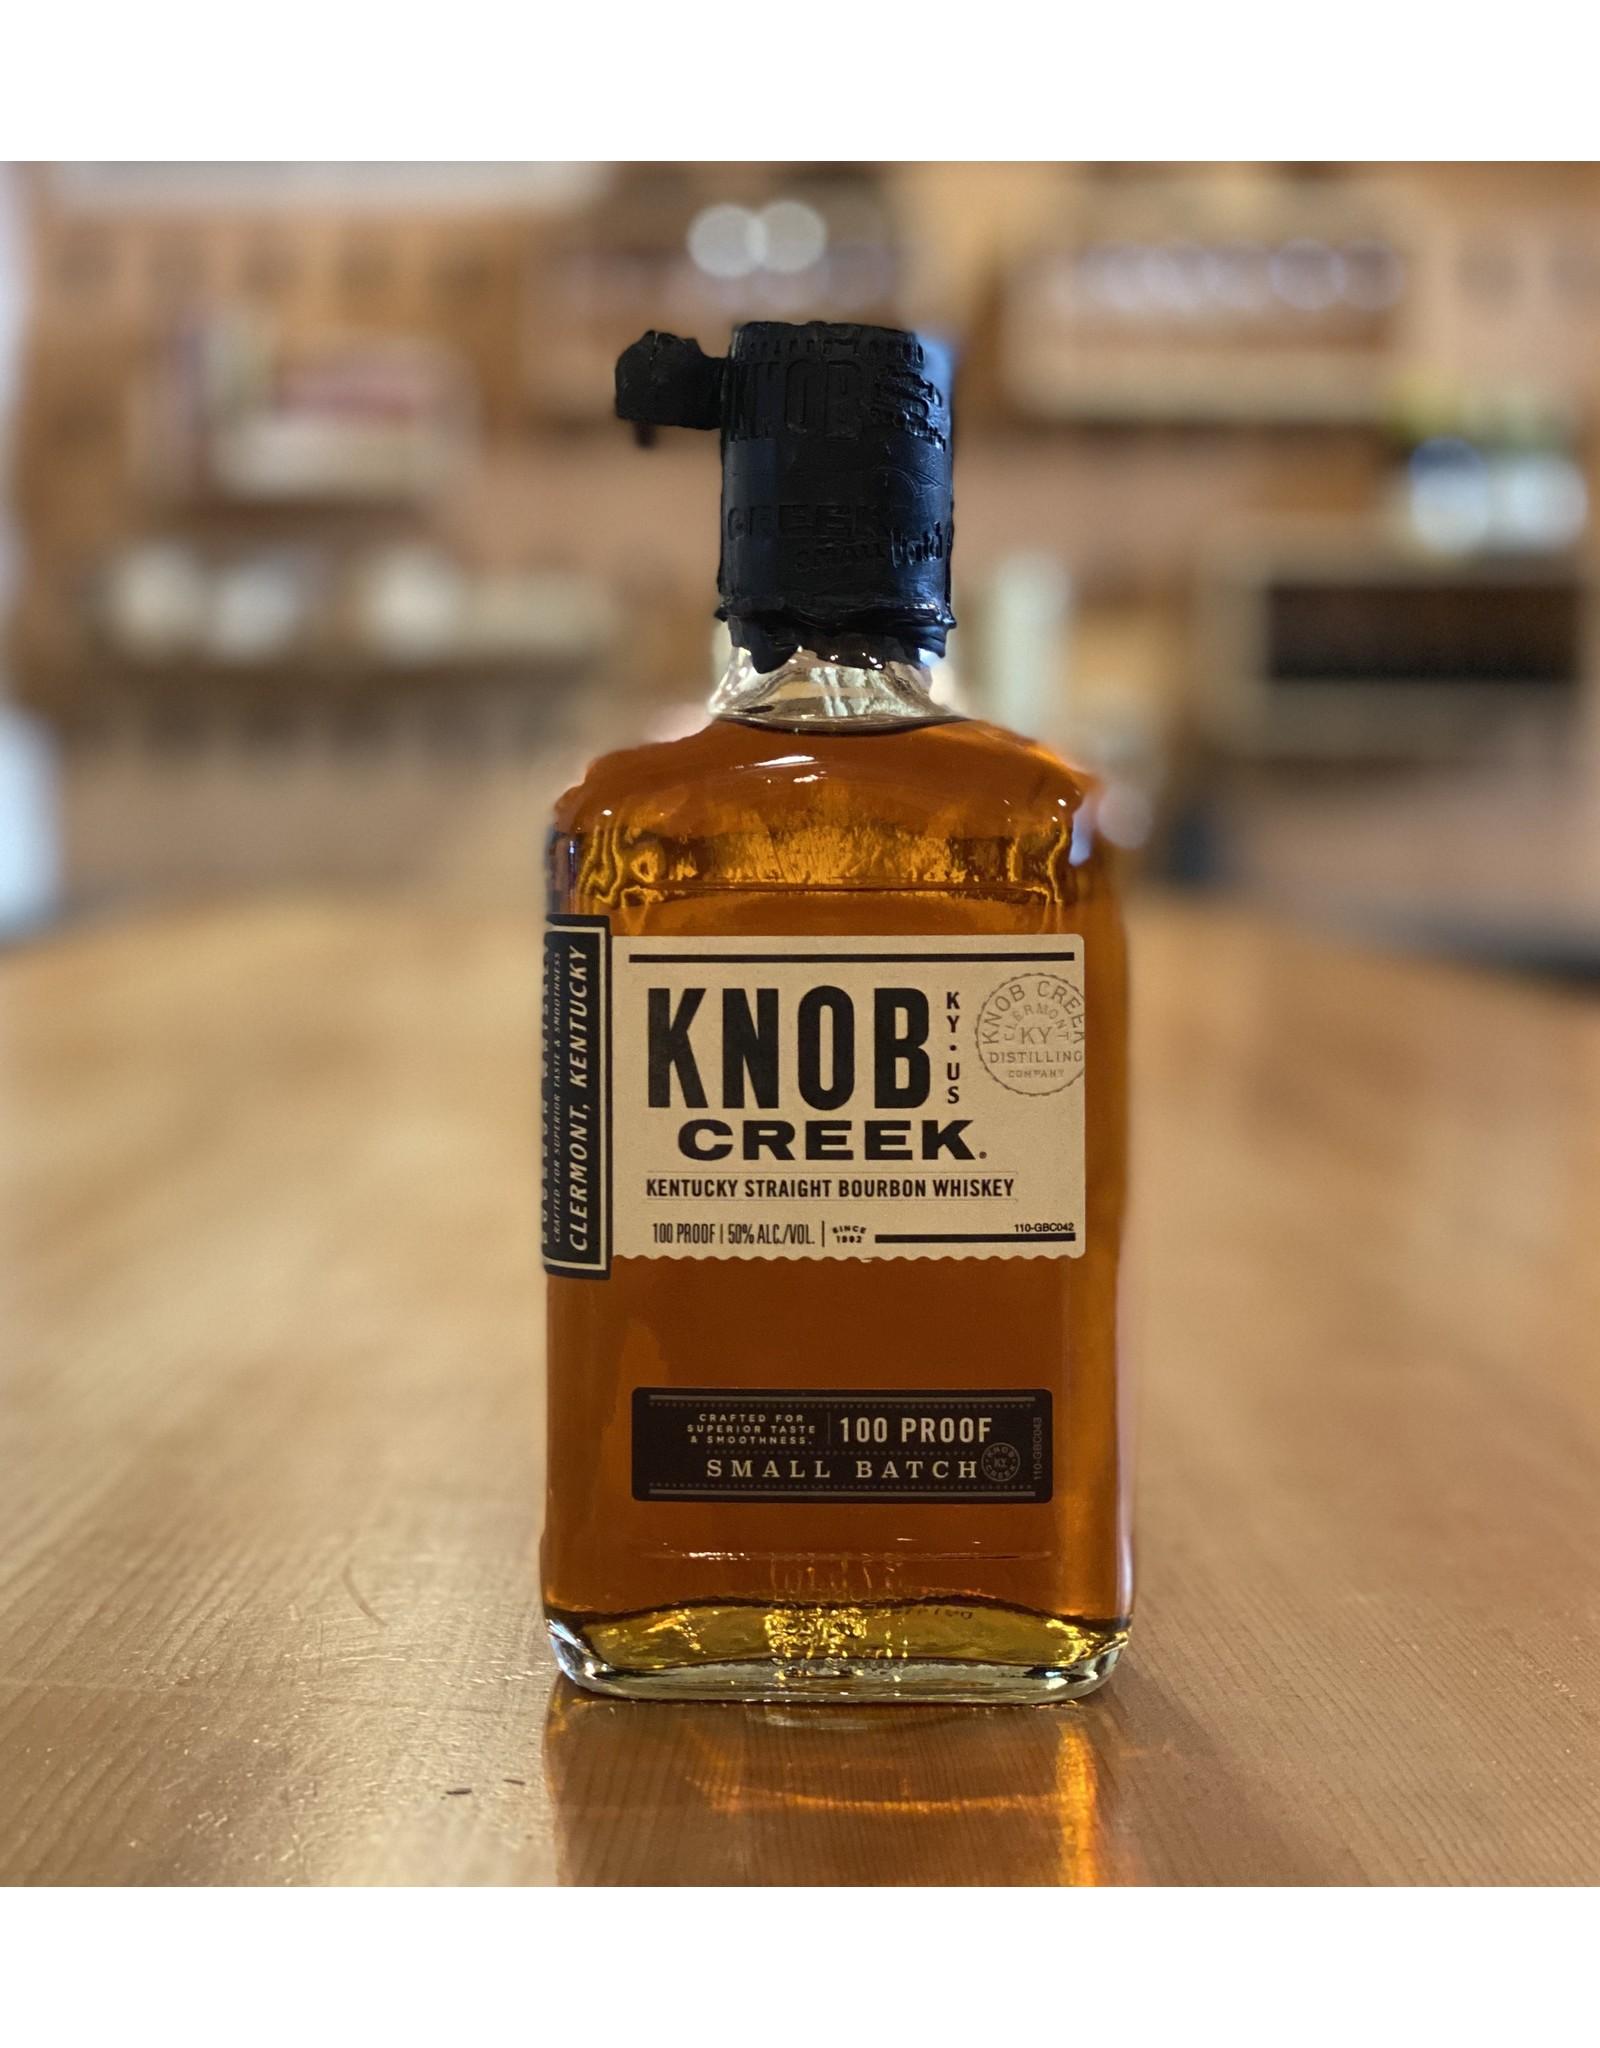 Bourbon Knob Creek Kentucky Straigth Bourbon Whiskey 375ml